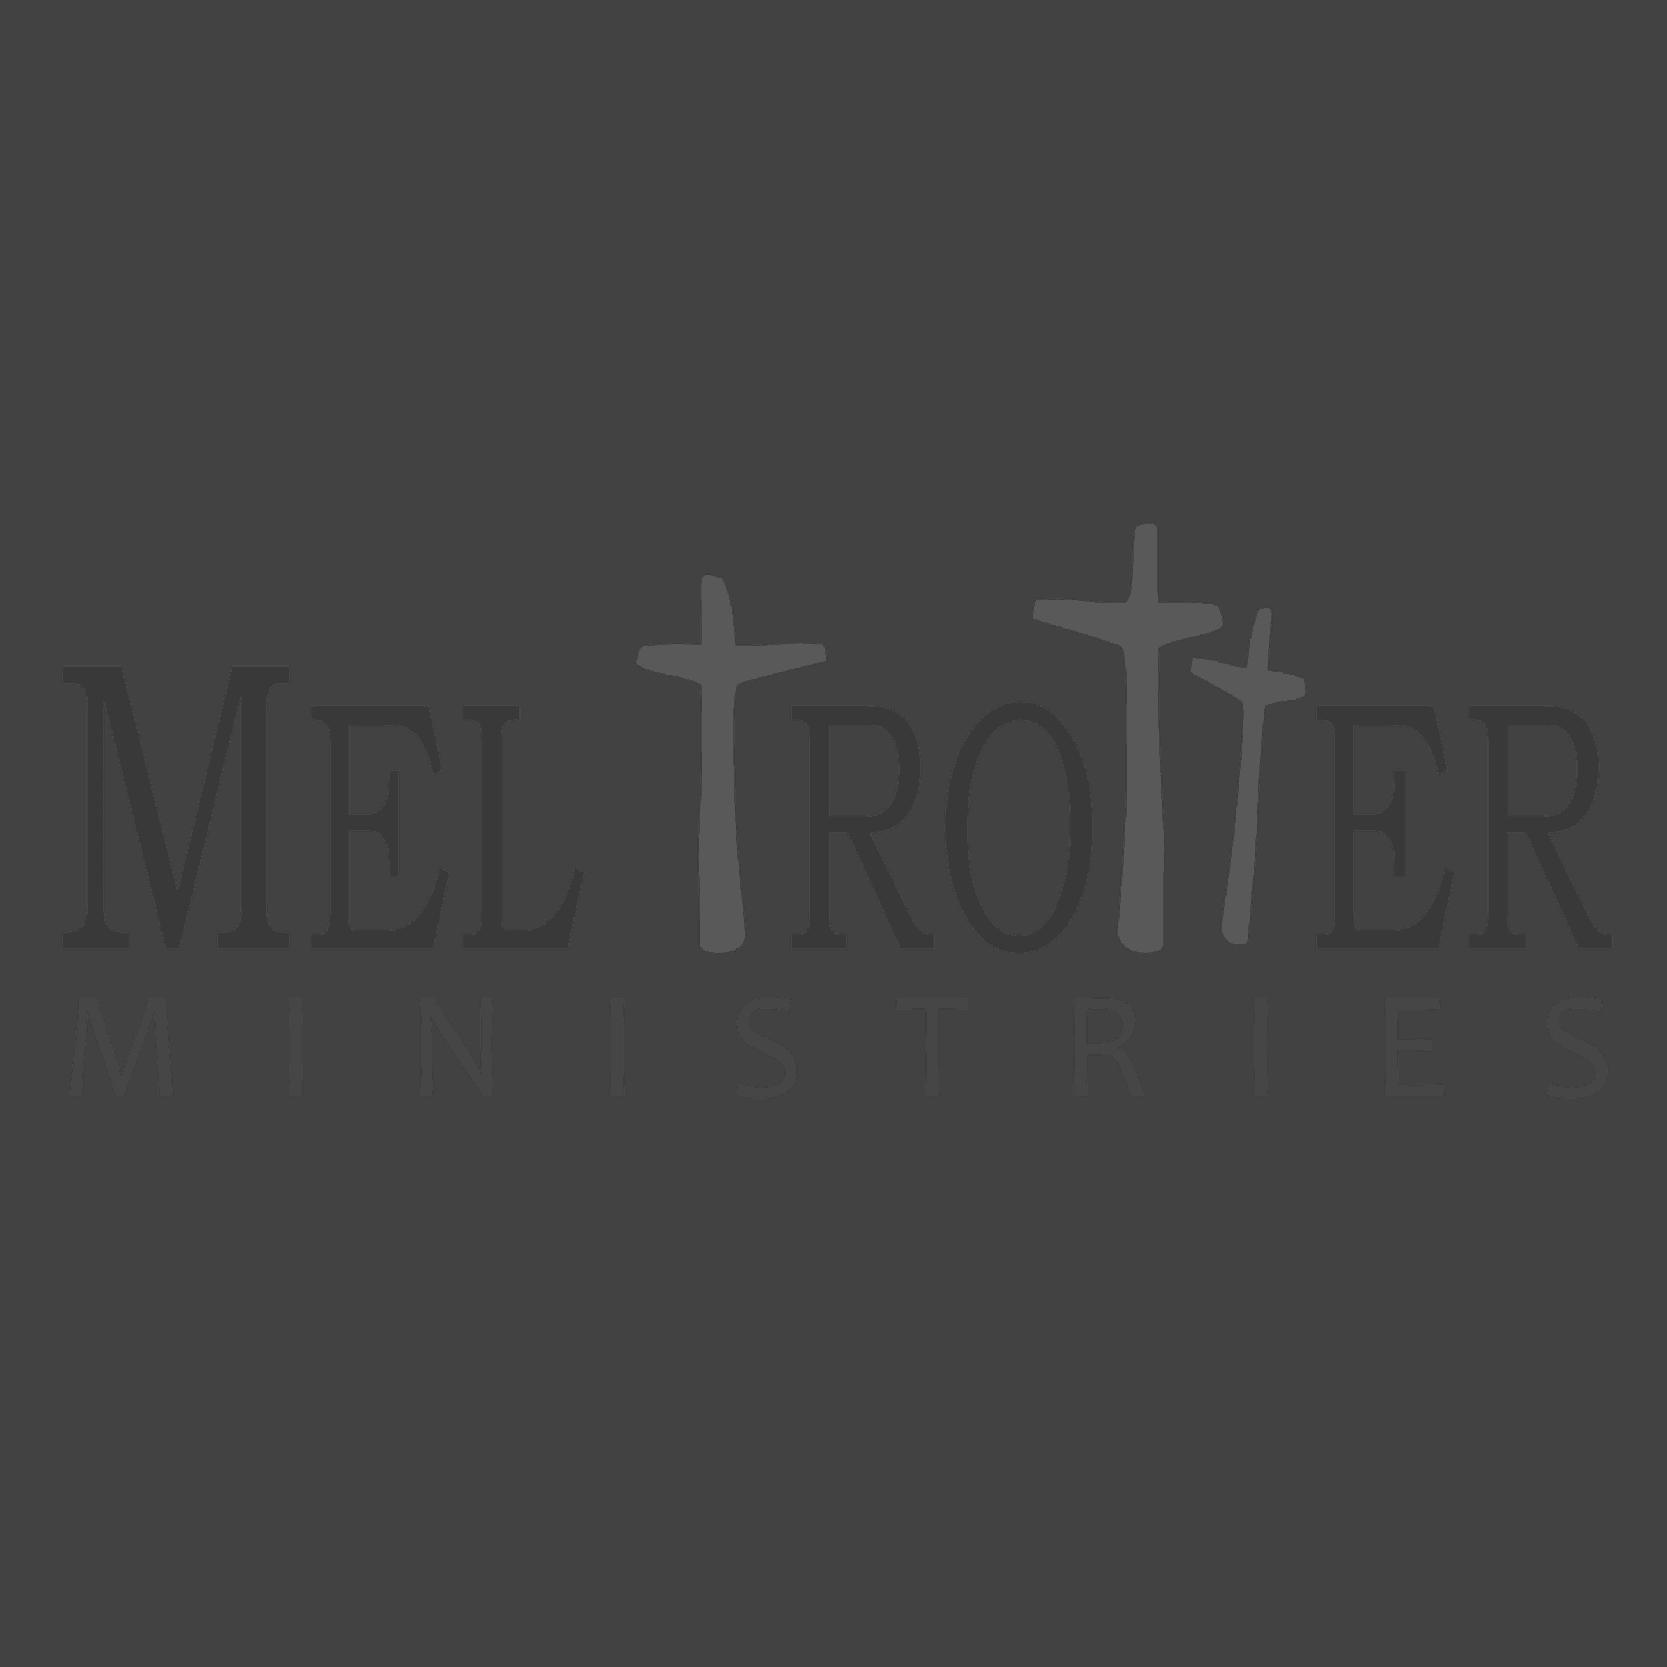 Mel Trotter Logo